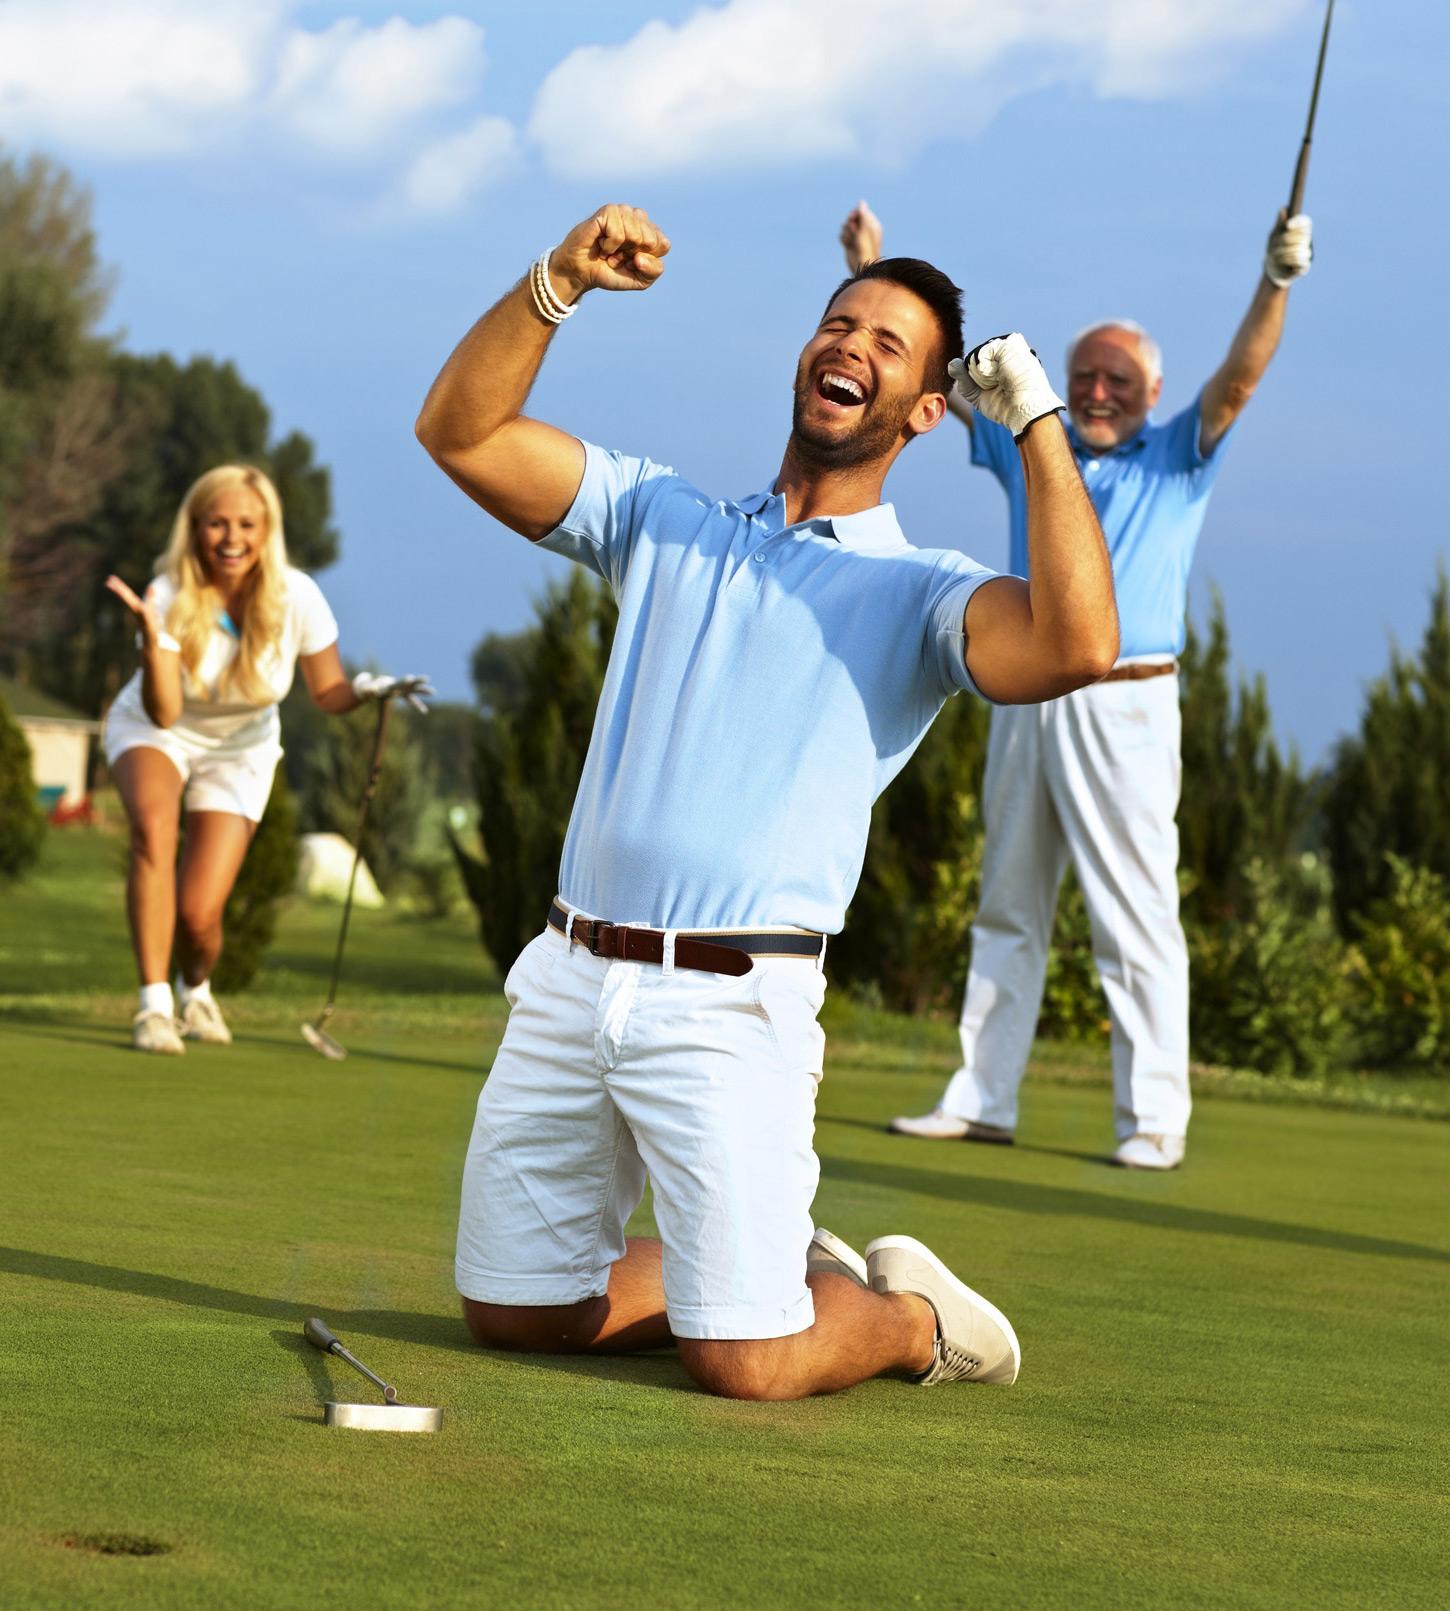 MindSail Golf Event